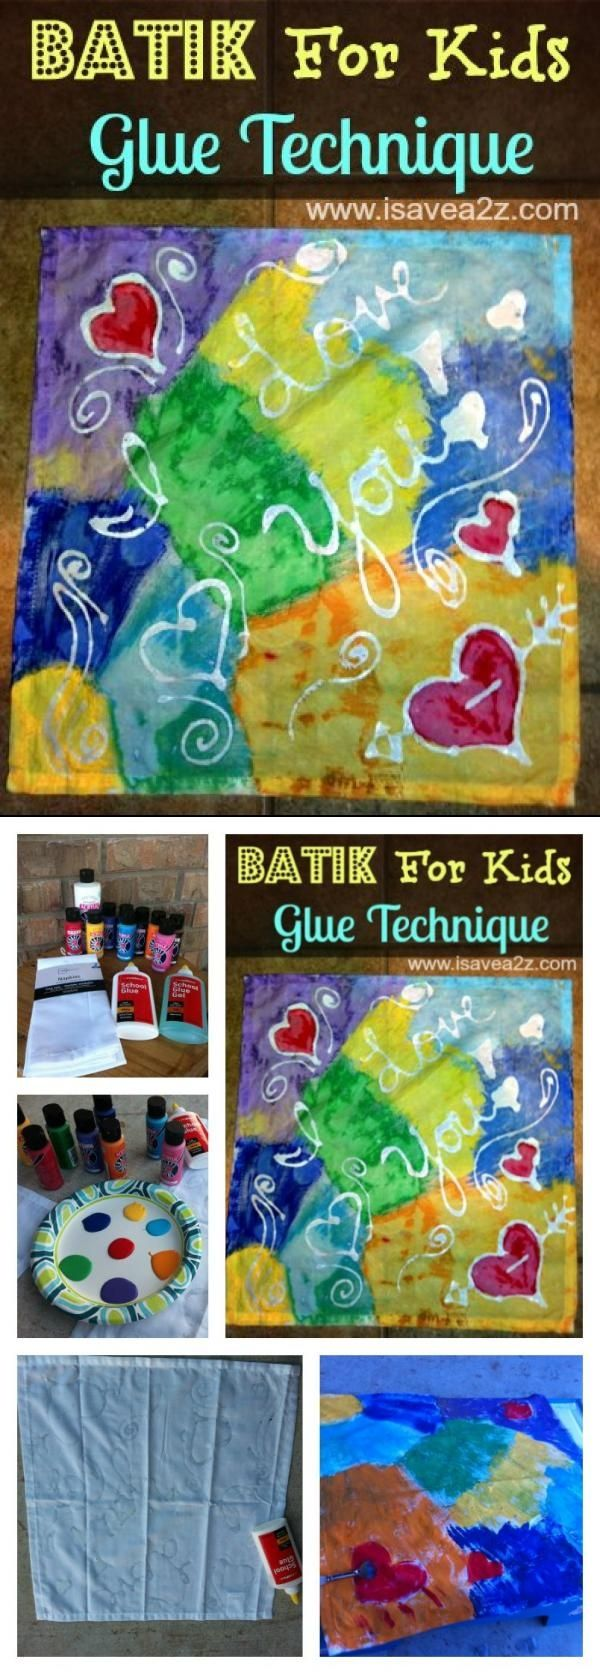 Batik For Kids Art Project Idea! This one is done with Elmer's Glue. http://www.isavea2z.com/batik-for-kids-art-project/